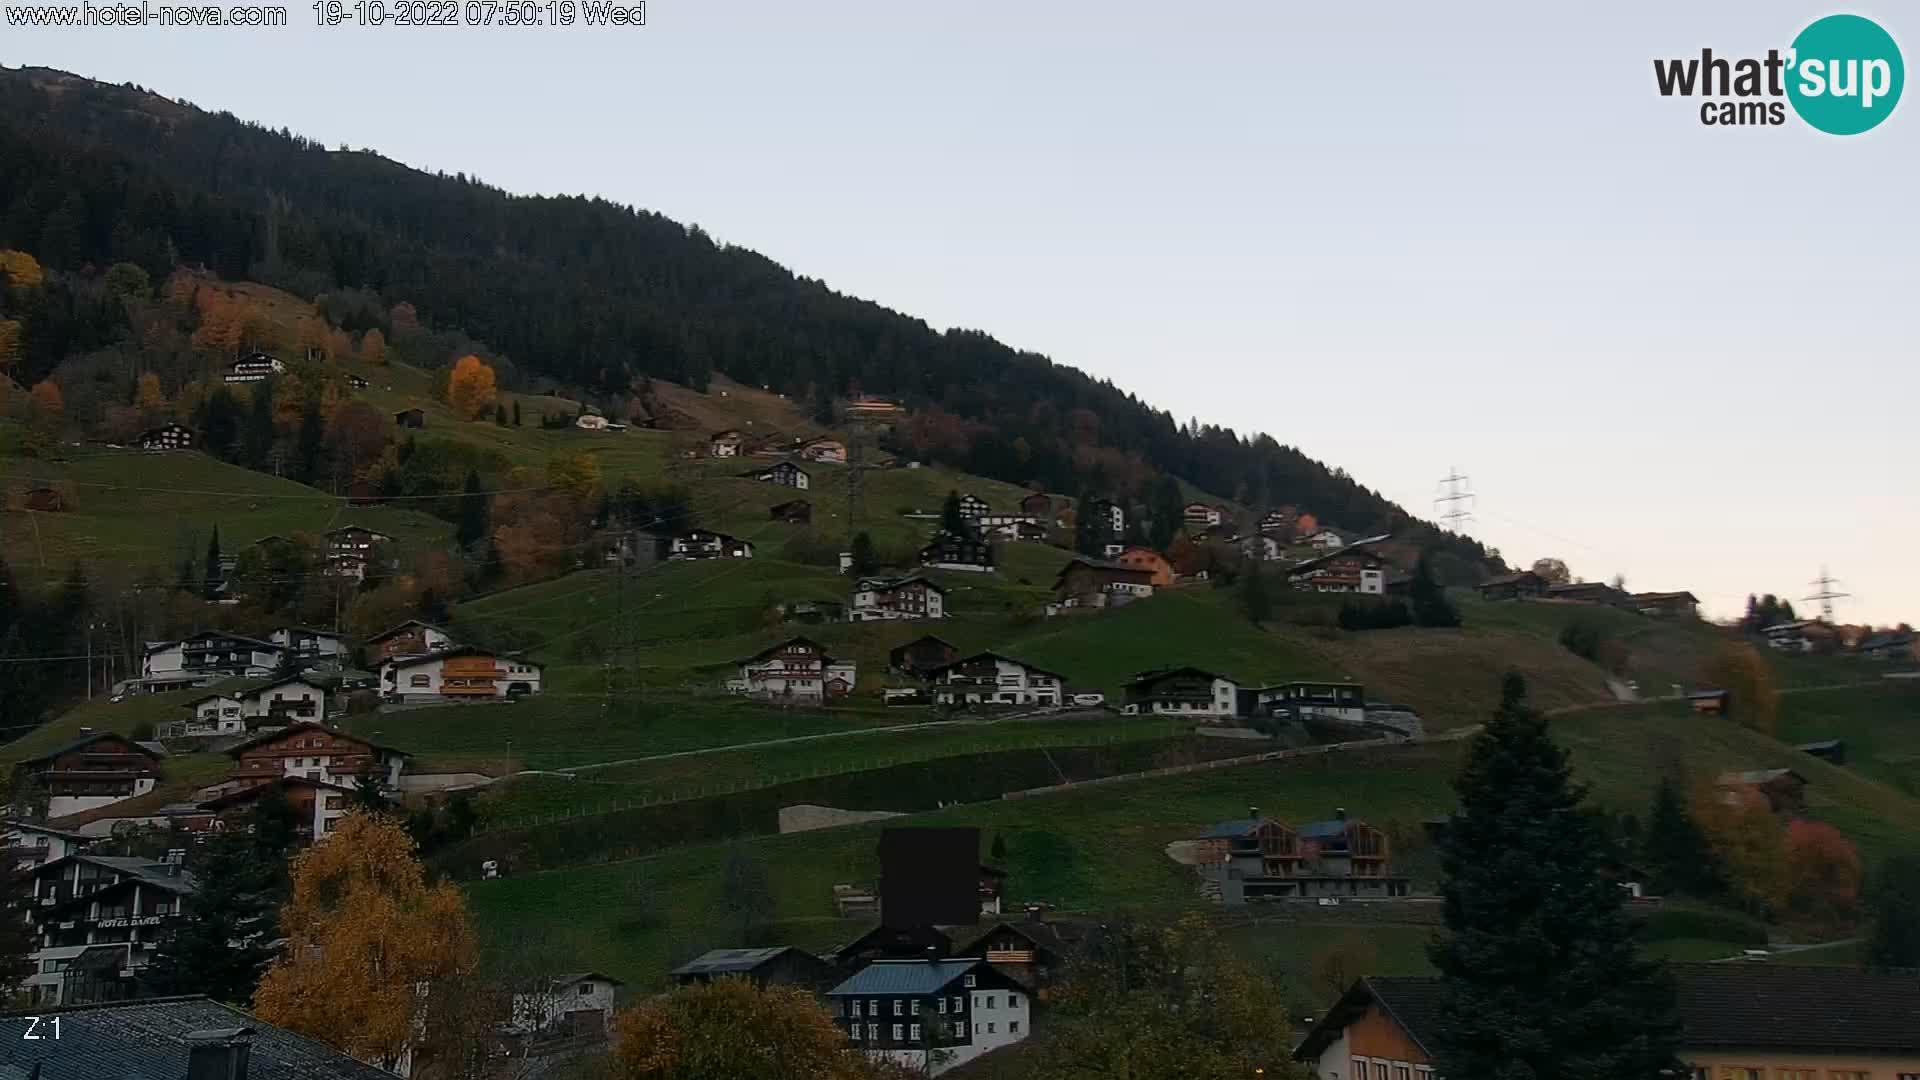 Gaschurn Livecam Hotel Nova – Montafon